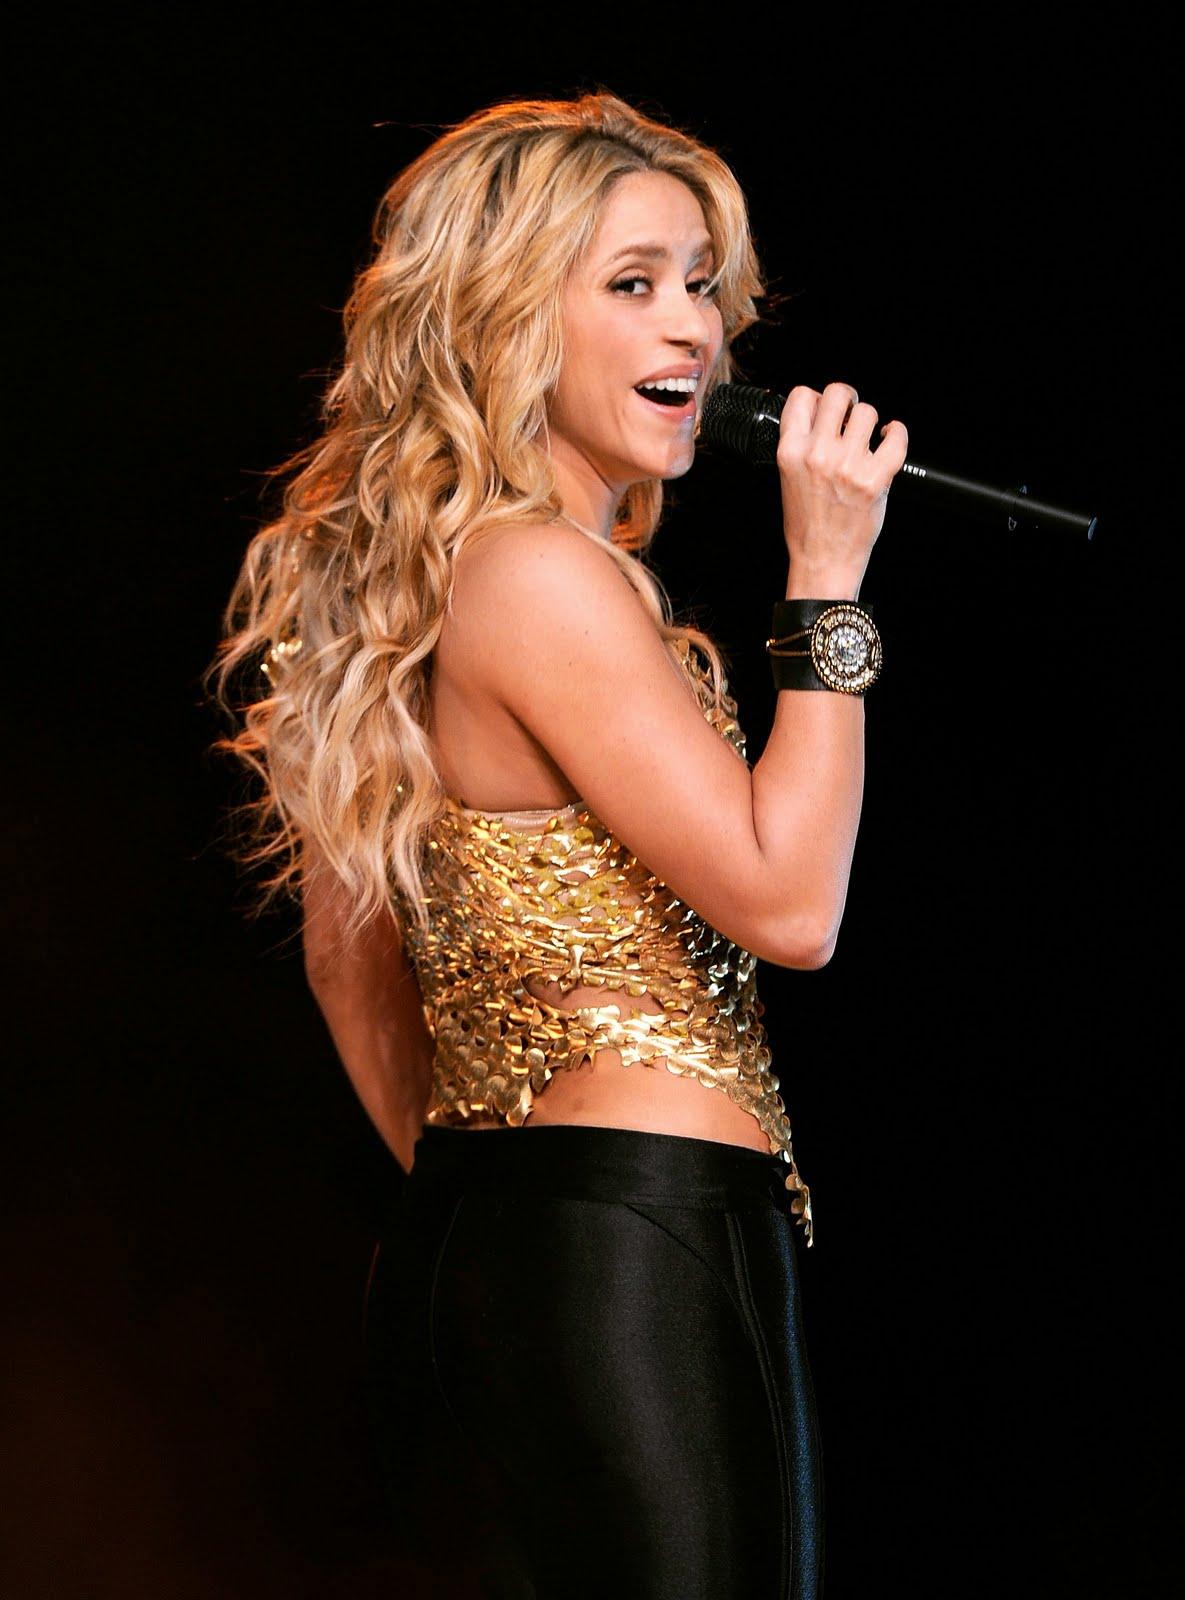 http://1.bp.blogspot.com/_6A8j2EQmANk/TJxf5SJt4bI/AAAAAAAASds/zroN7V4kRIw/s1600/Shakira+Live+Performance+at+Madison+Square+Garden+Pictures7.jpg